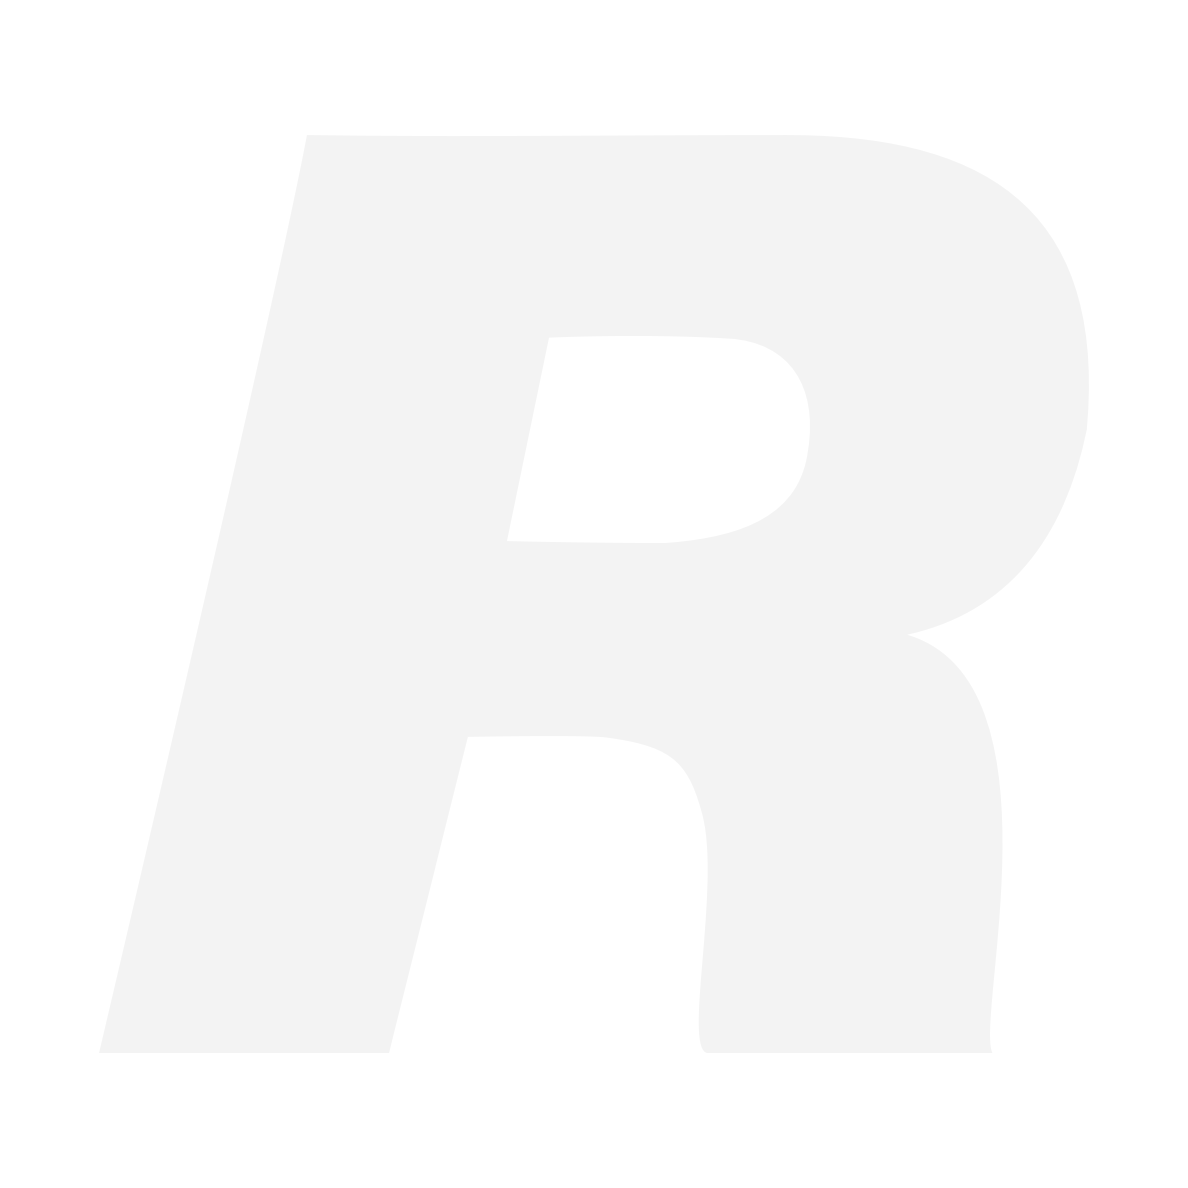 GoPro Hero 7 Silver + Lowepro Dashpoint AVC1